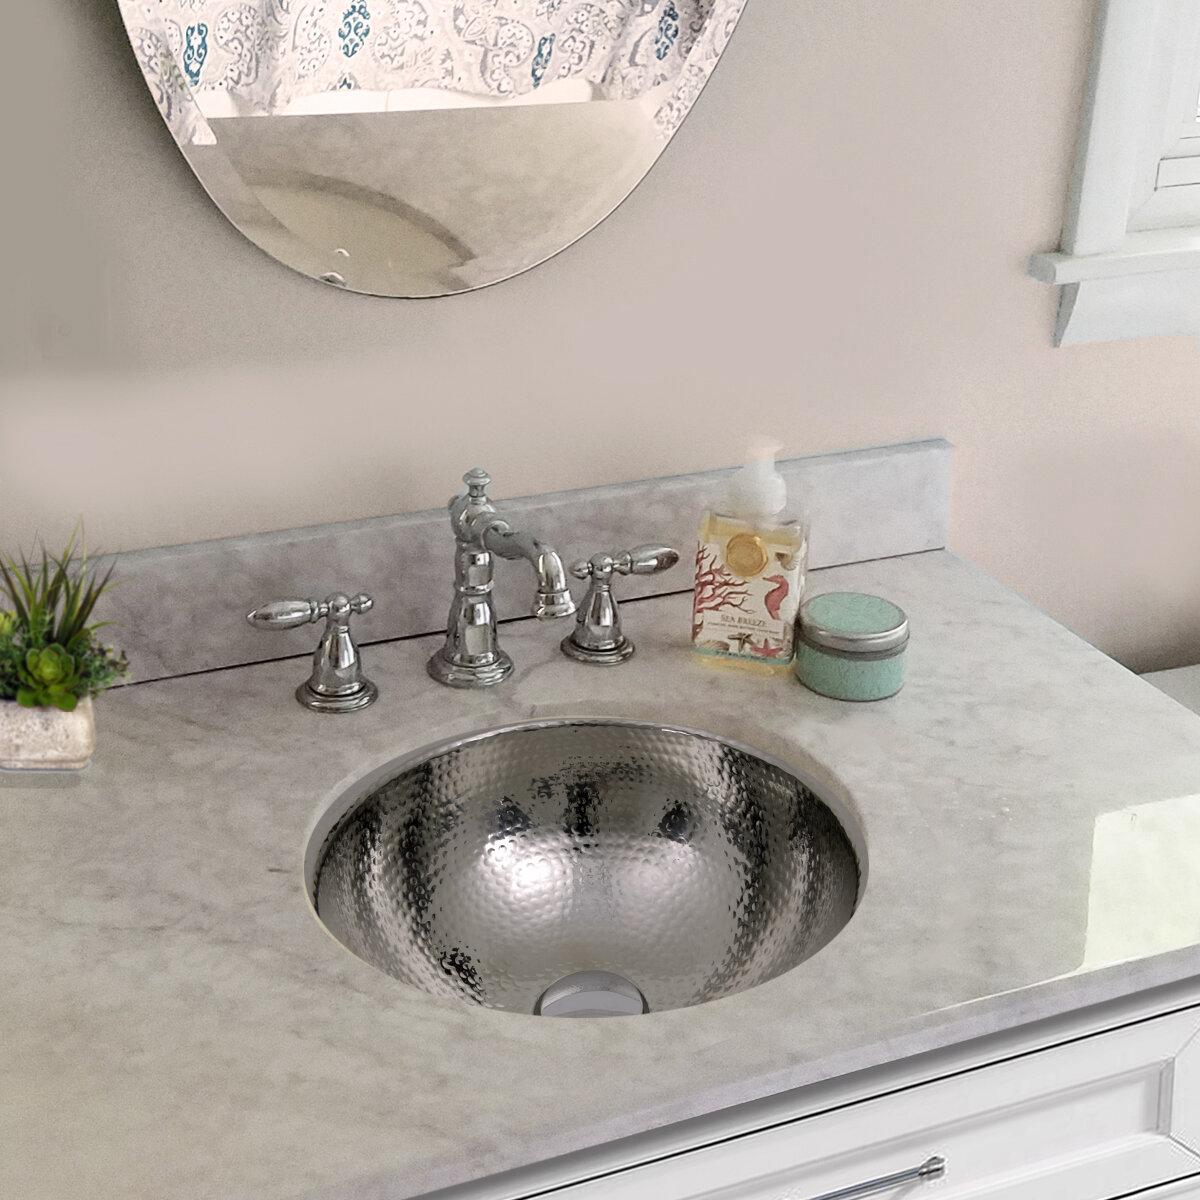 Hand Hammered Stainless Steel Circular Undermount Bathroom Sink With Overflow